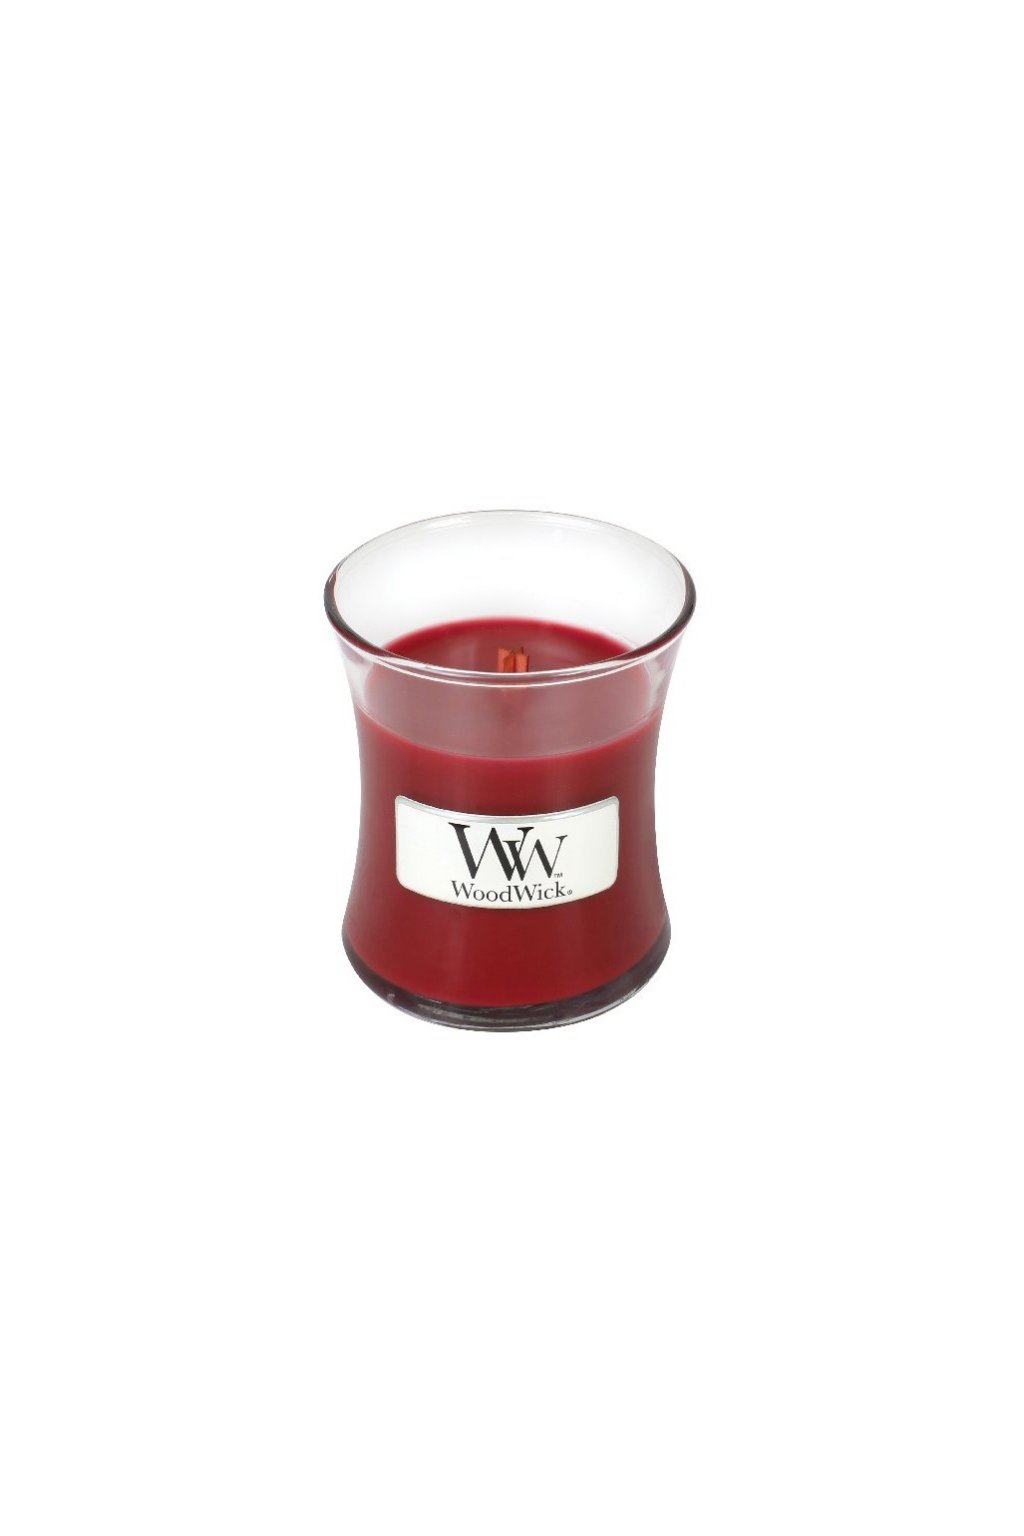 woodwick vonna svicka mala vaza pomegranate 85 g 1